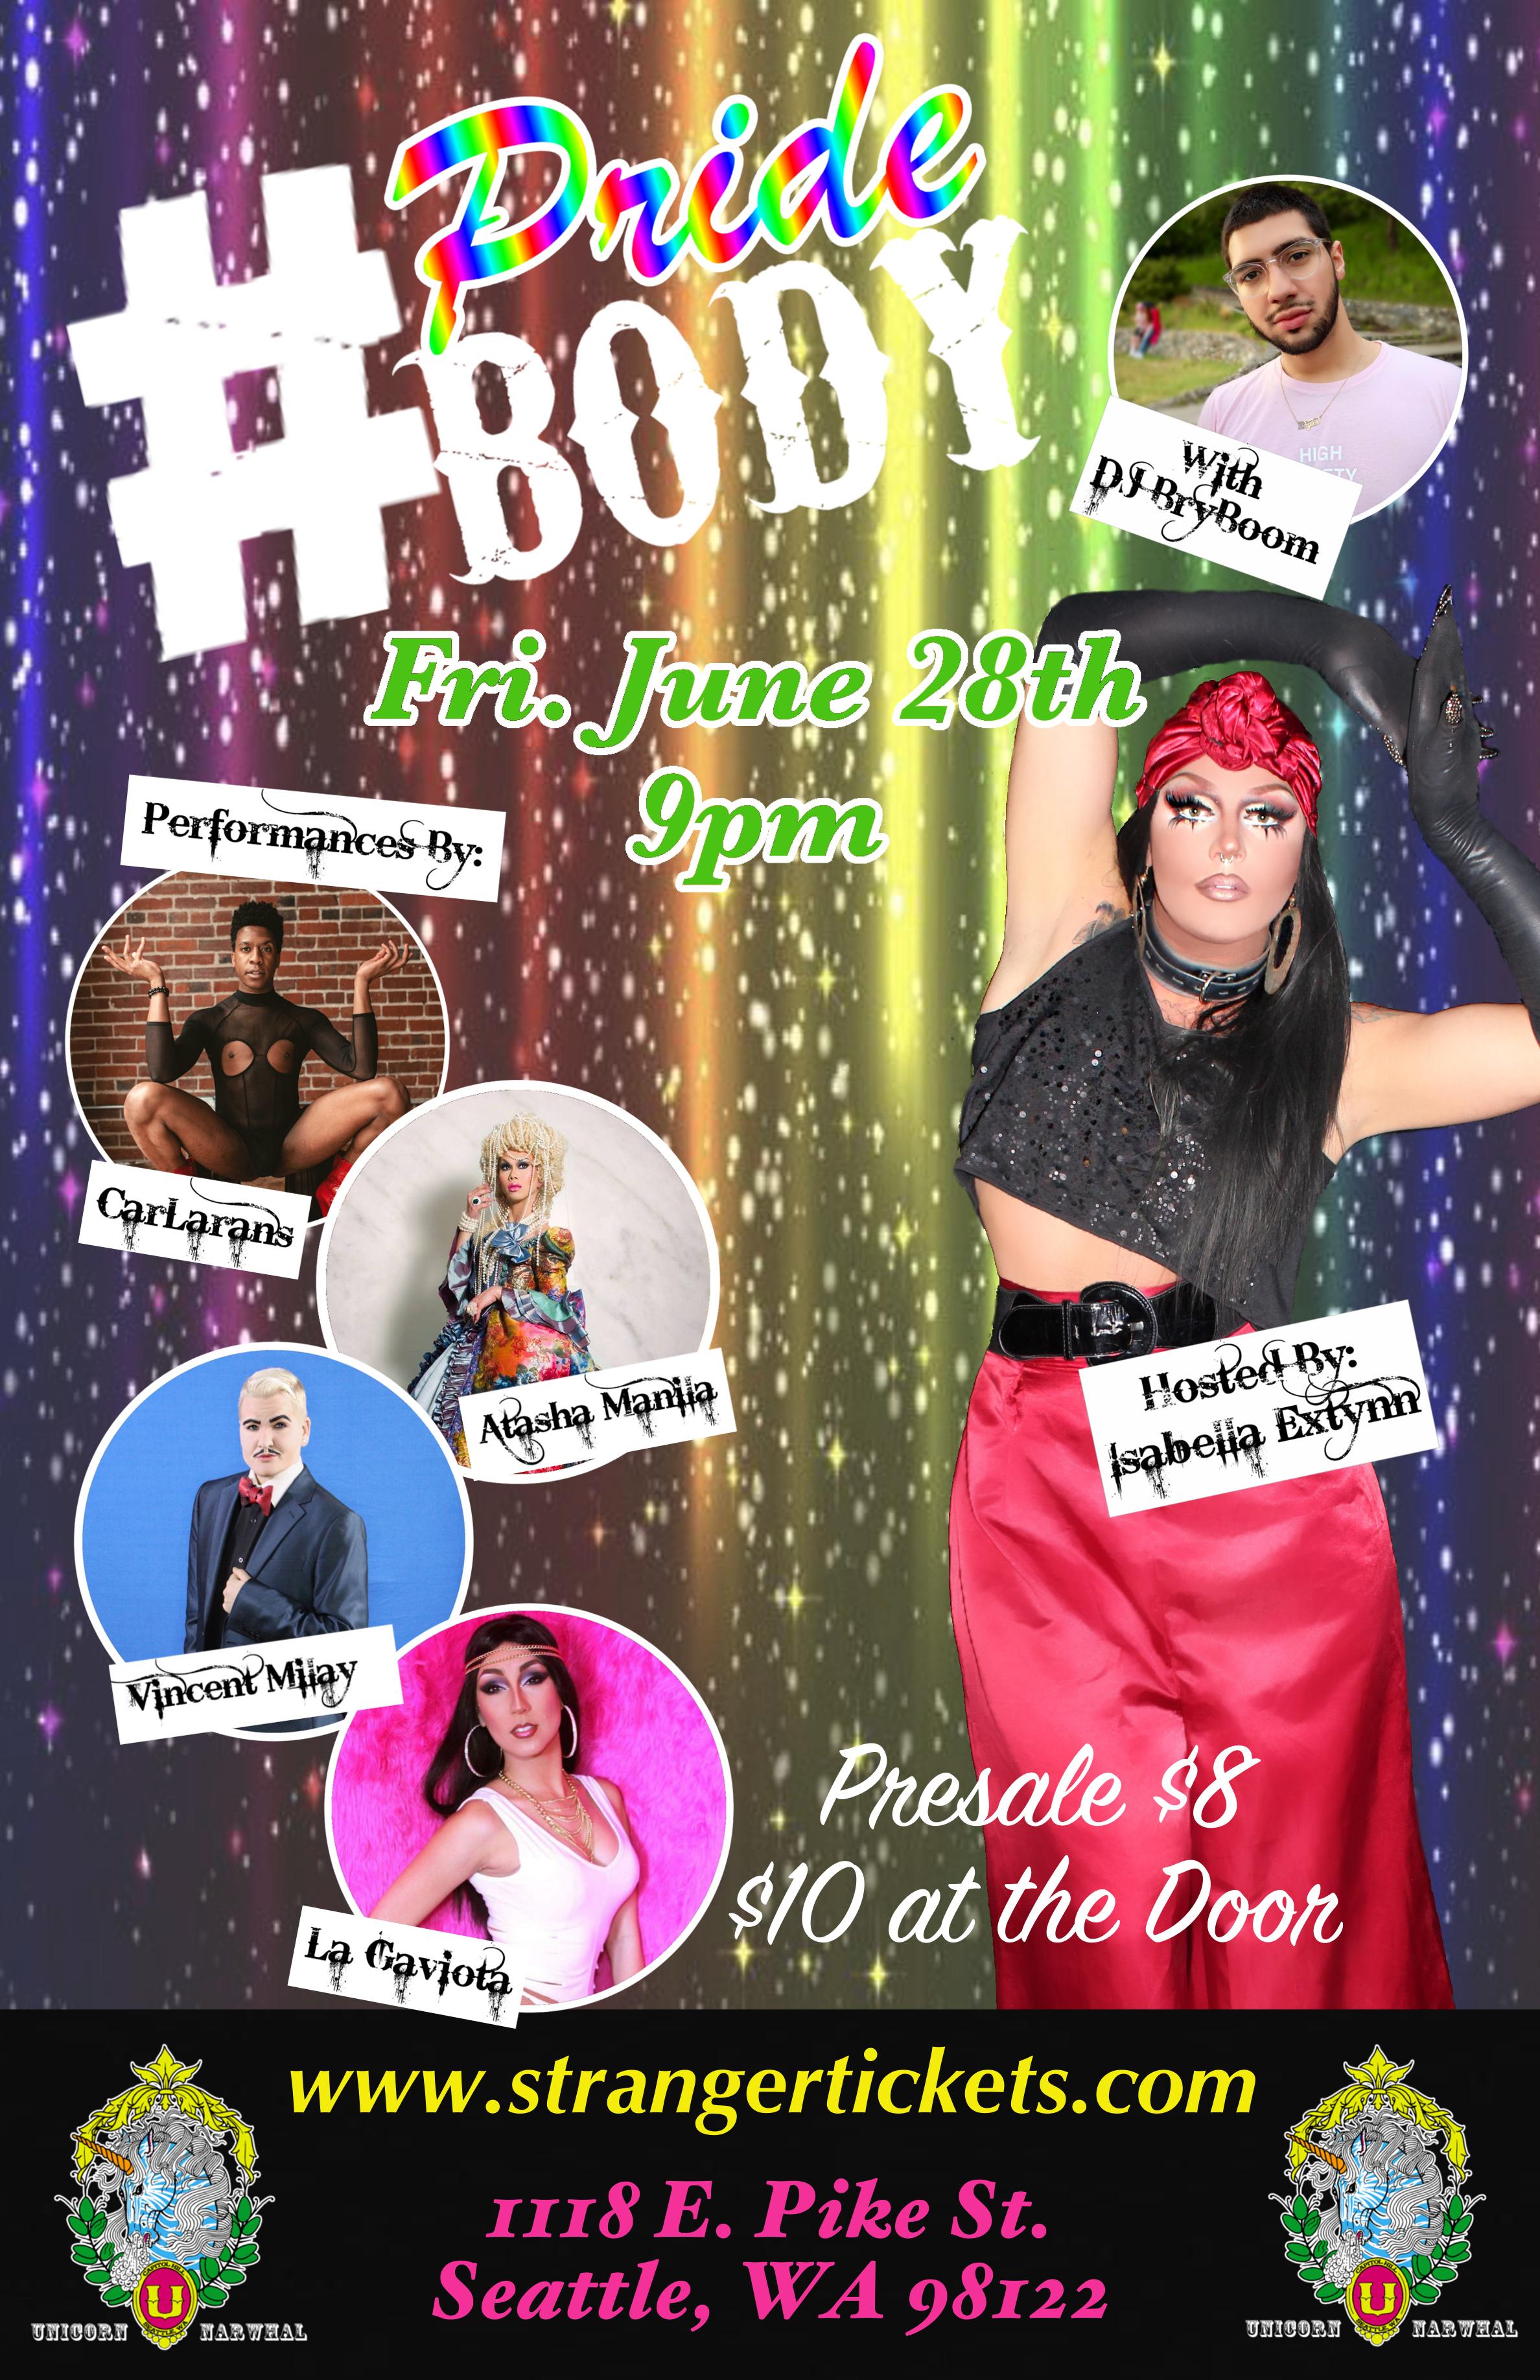 PrideBody Poster.JPG